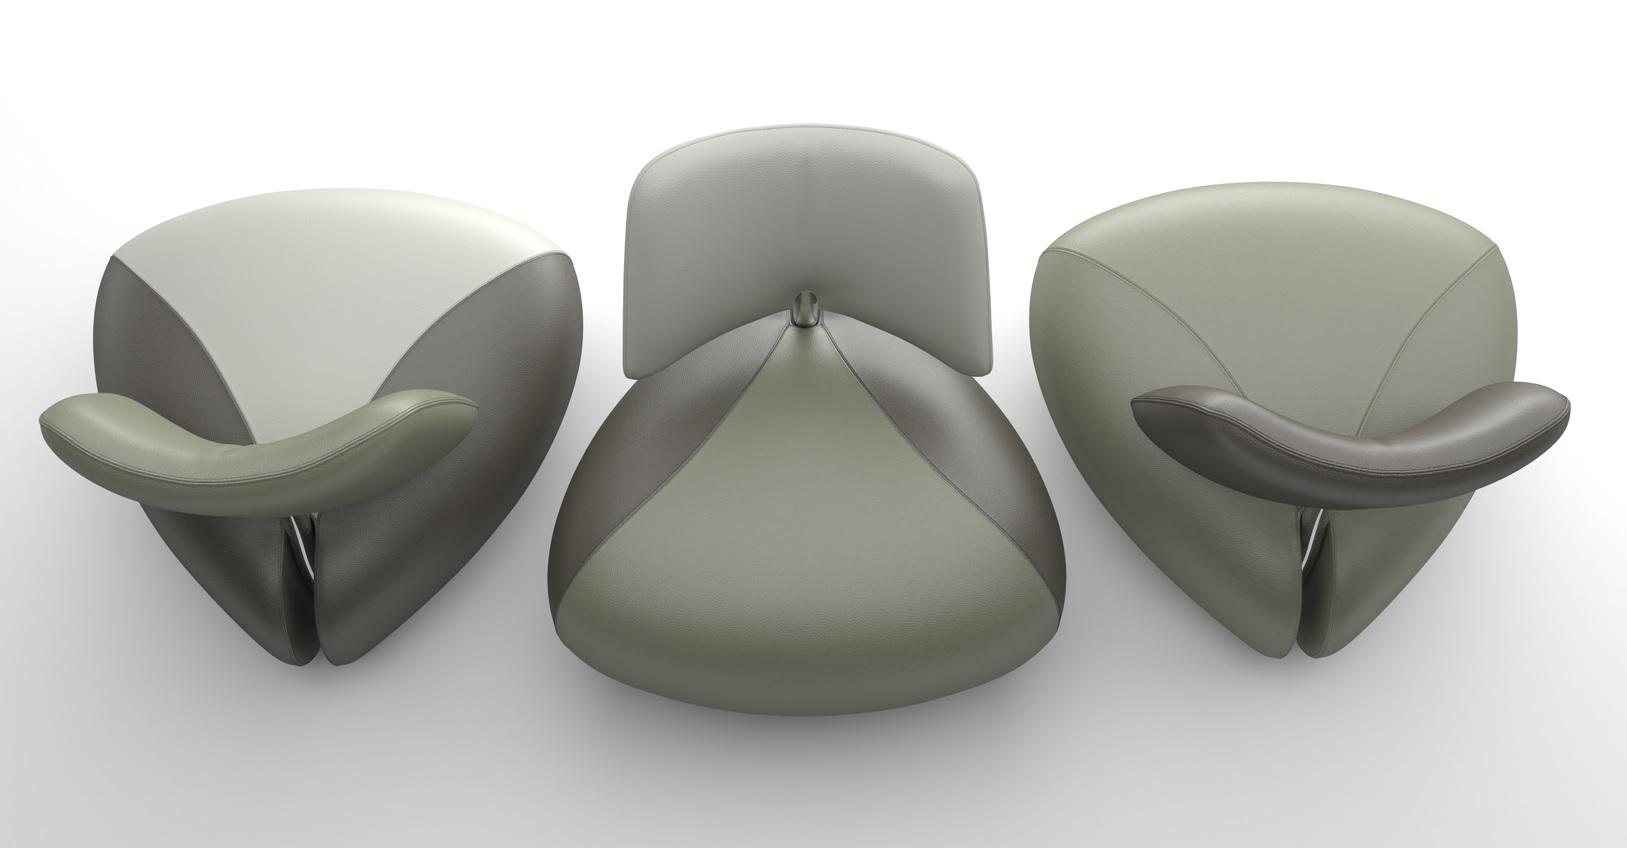 Leolux Pallone design fauteuil